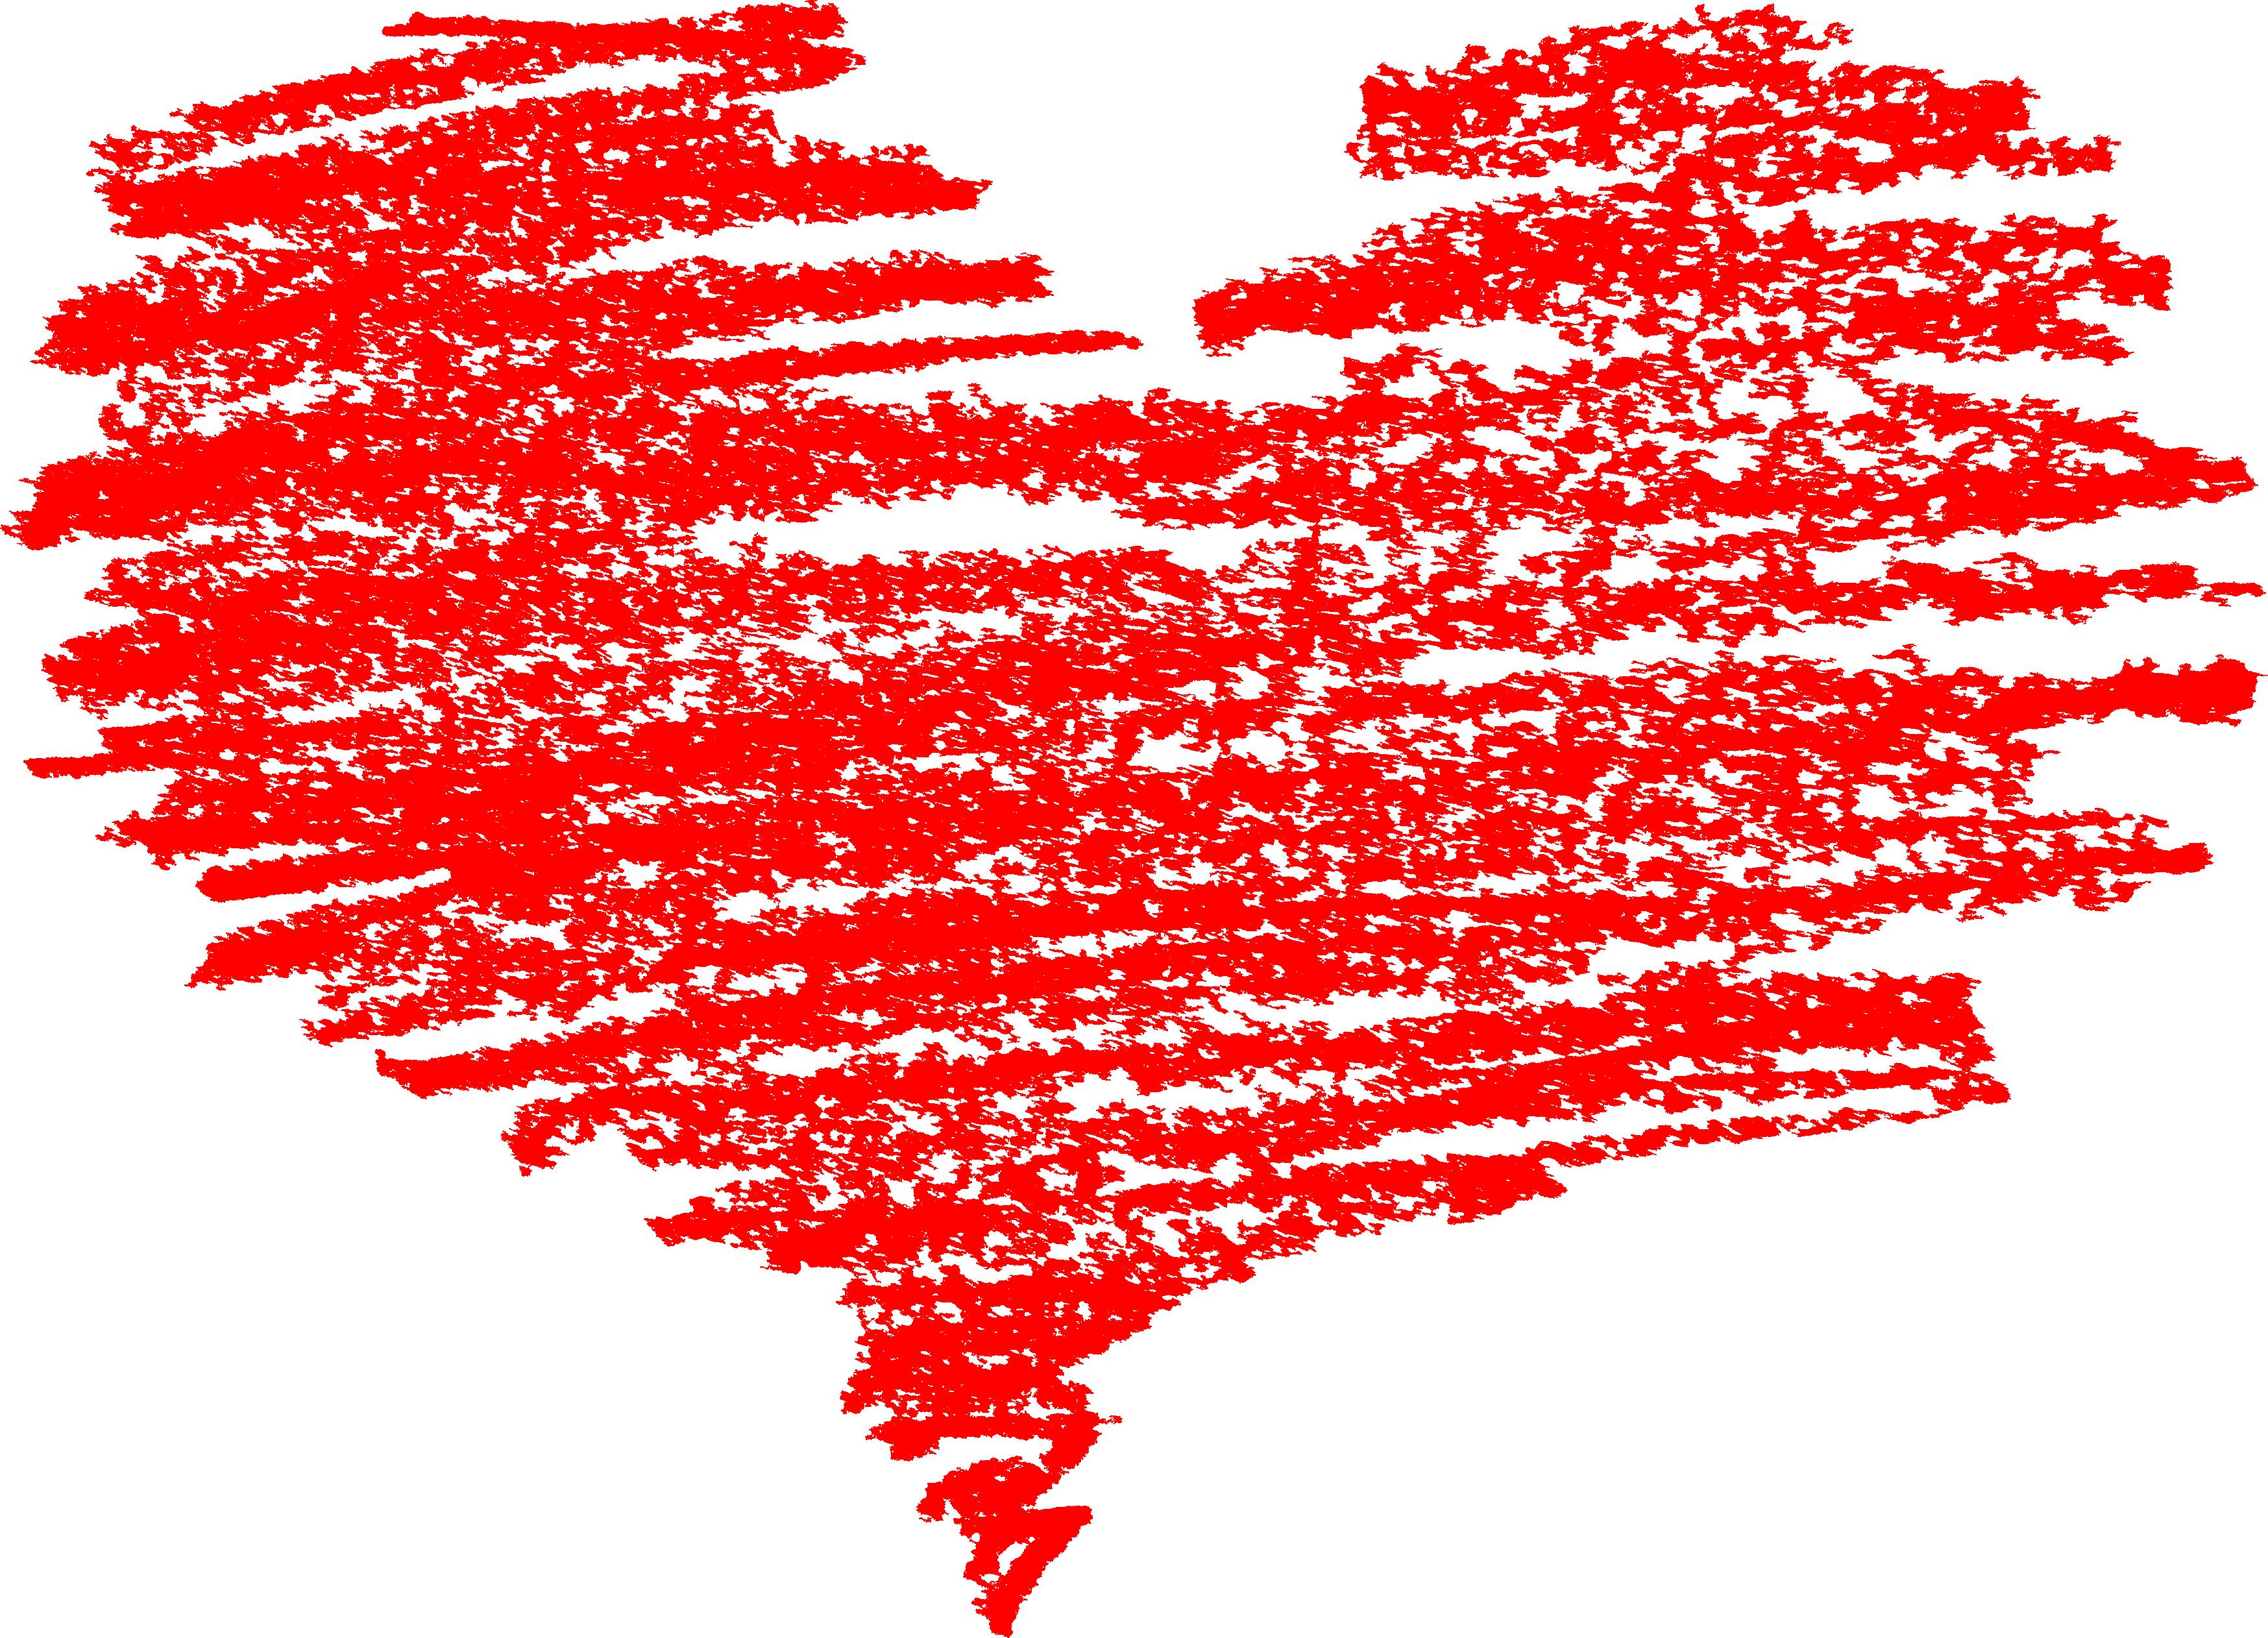 Crayon heart clipart svg transparent 5 Scribble Heart (PNG Transparent) | OnlyGFX.com svg transparent